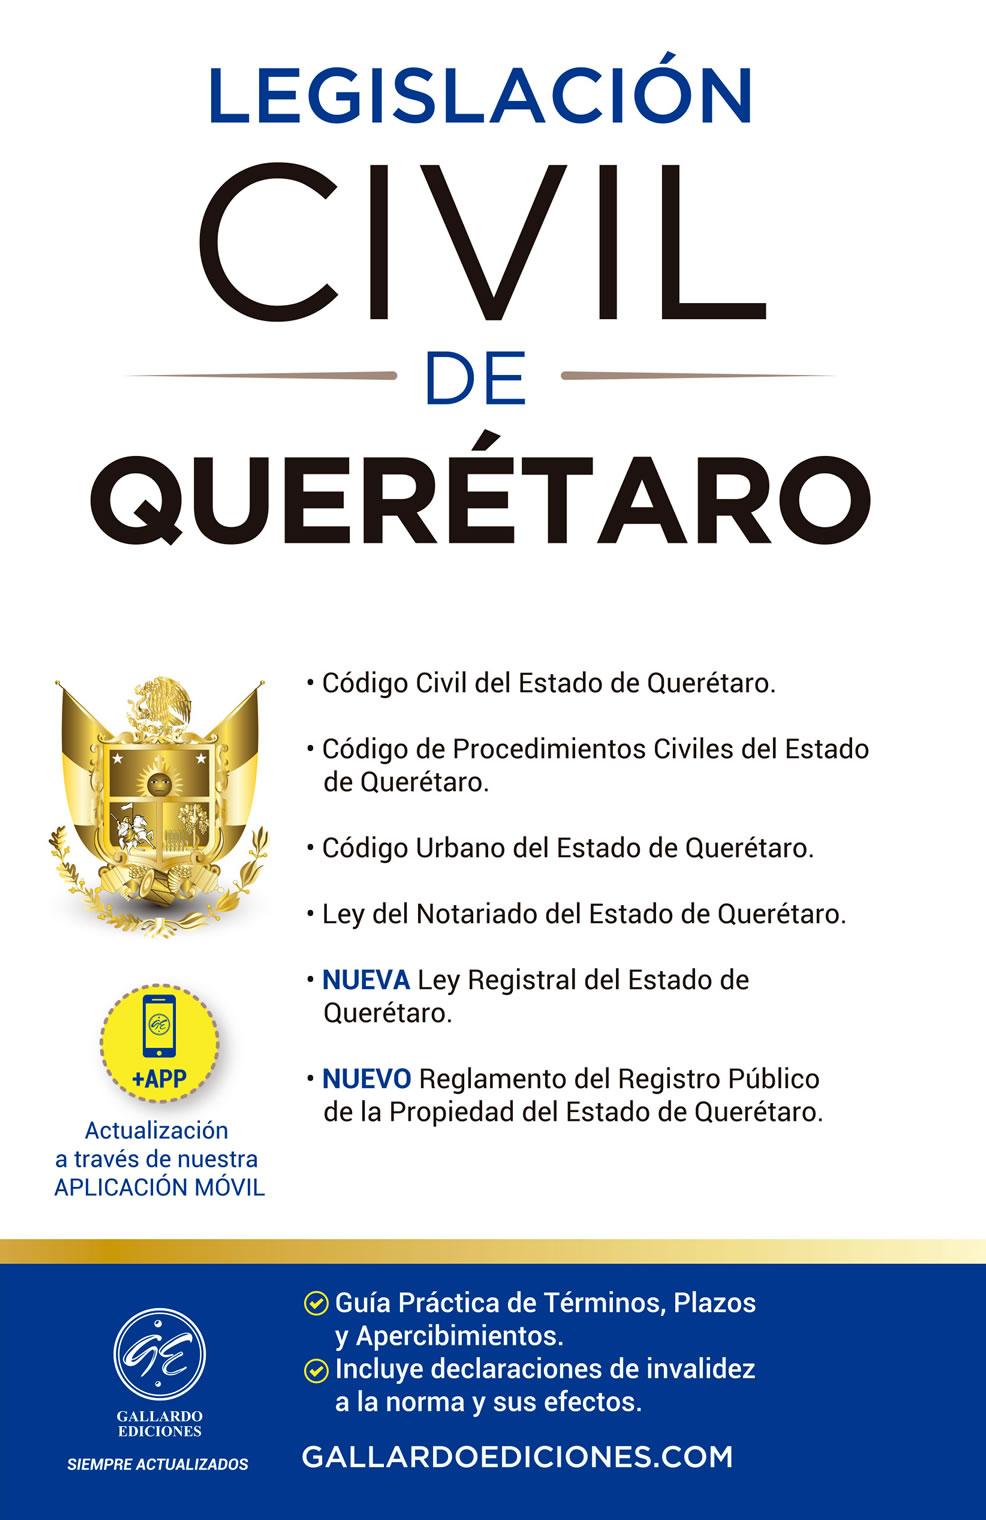 Legislación Civil de Querétaro 2021